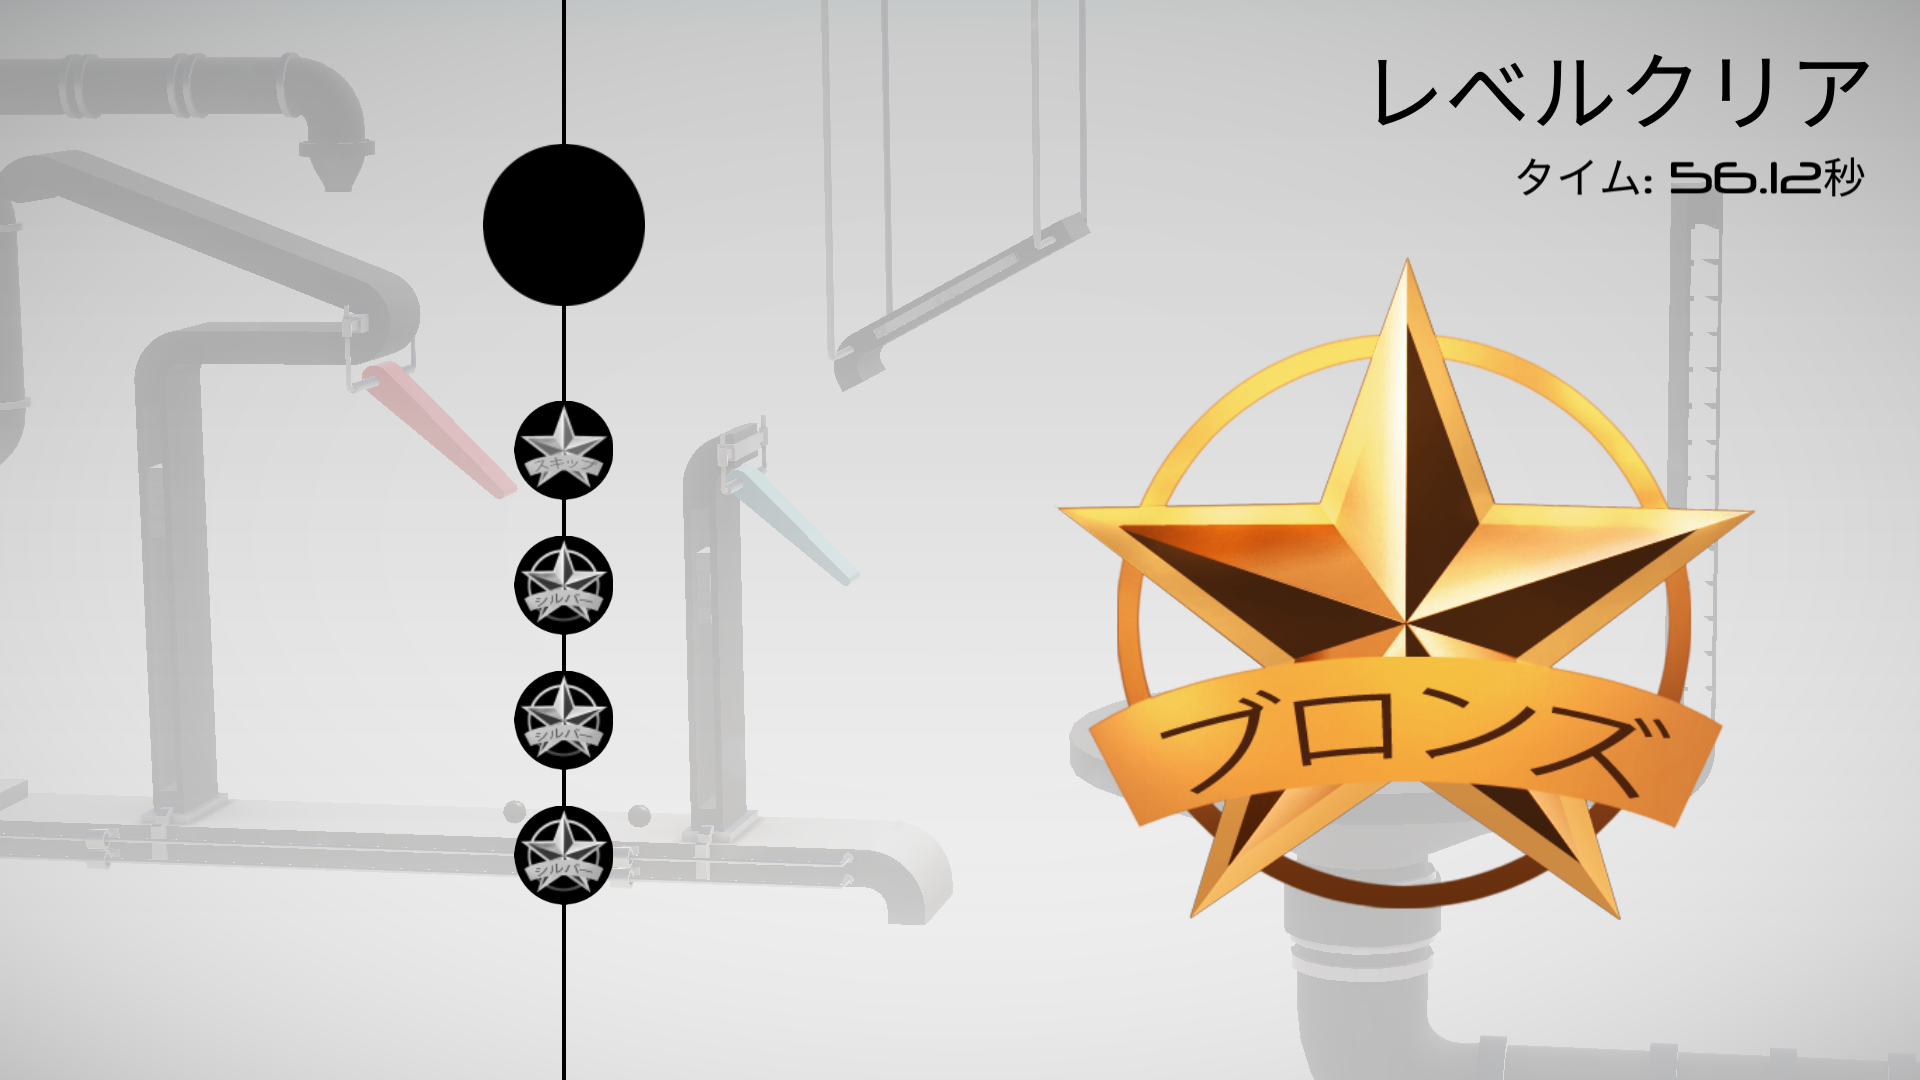 androidアプリ Perchang -パズルボール-攻略スクリーンショット7